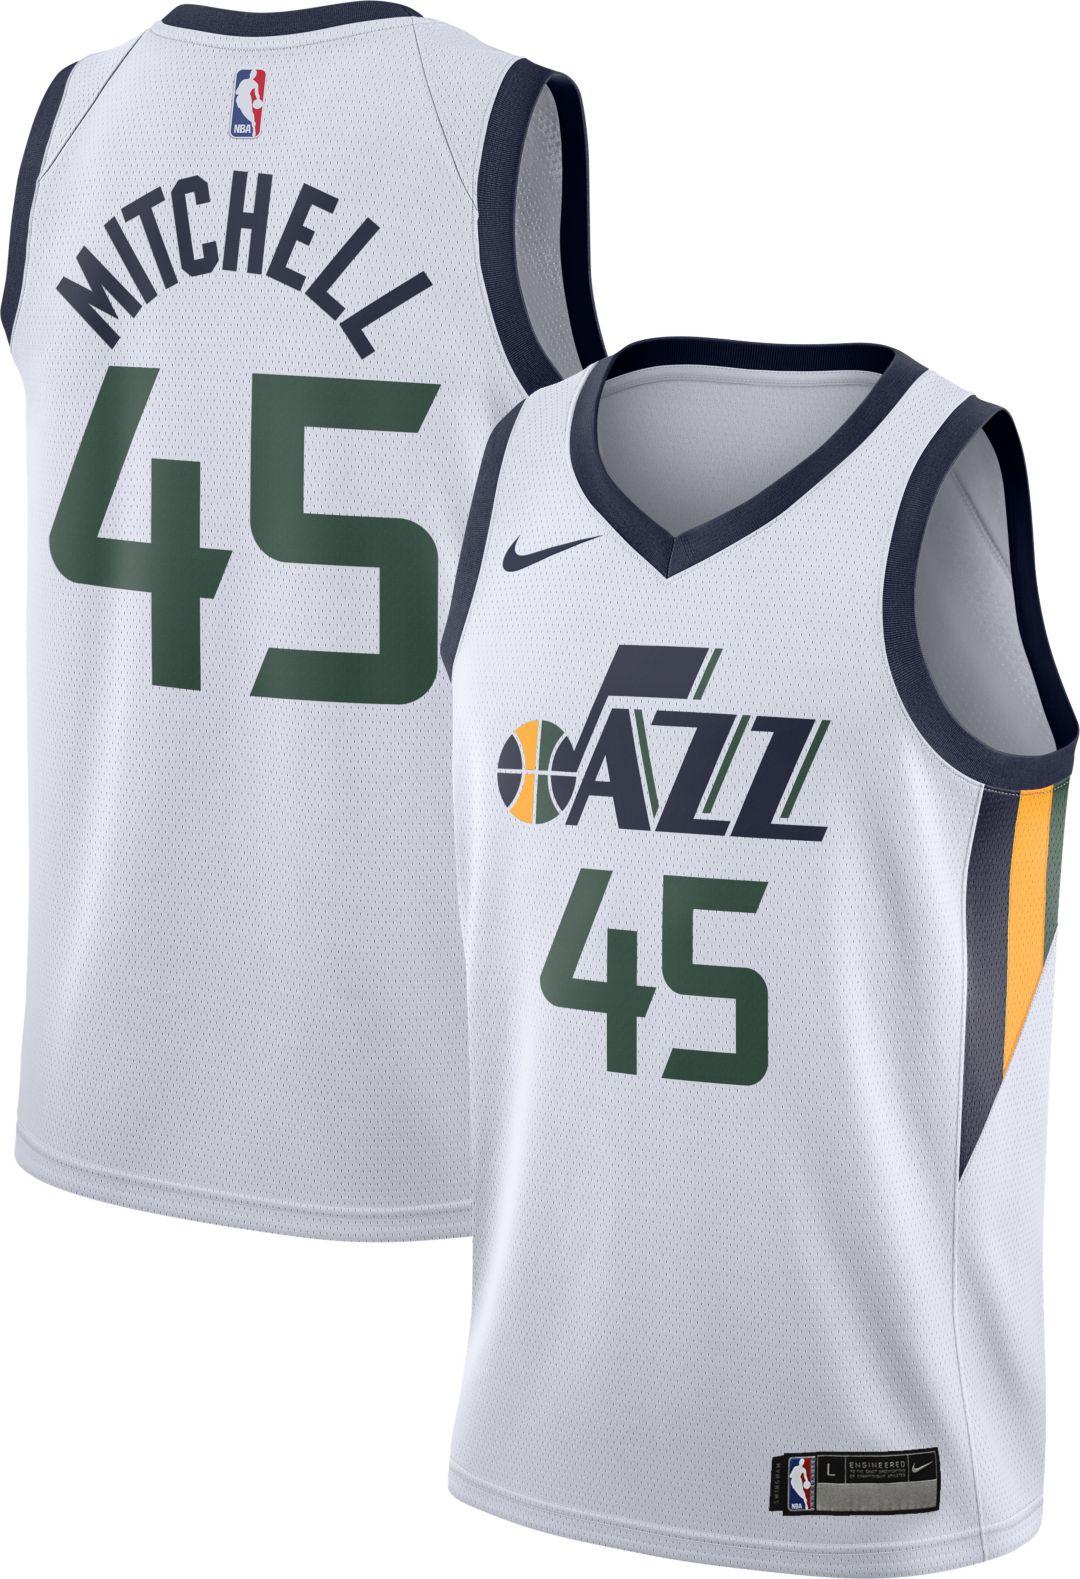 huge discount 16868 fe0cf Nike Youth Utah Jazz Donovan Mitchell #45 White Dri-FIT Swingman Jersey